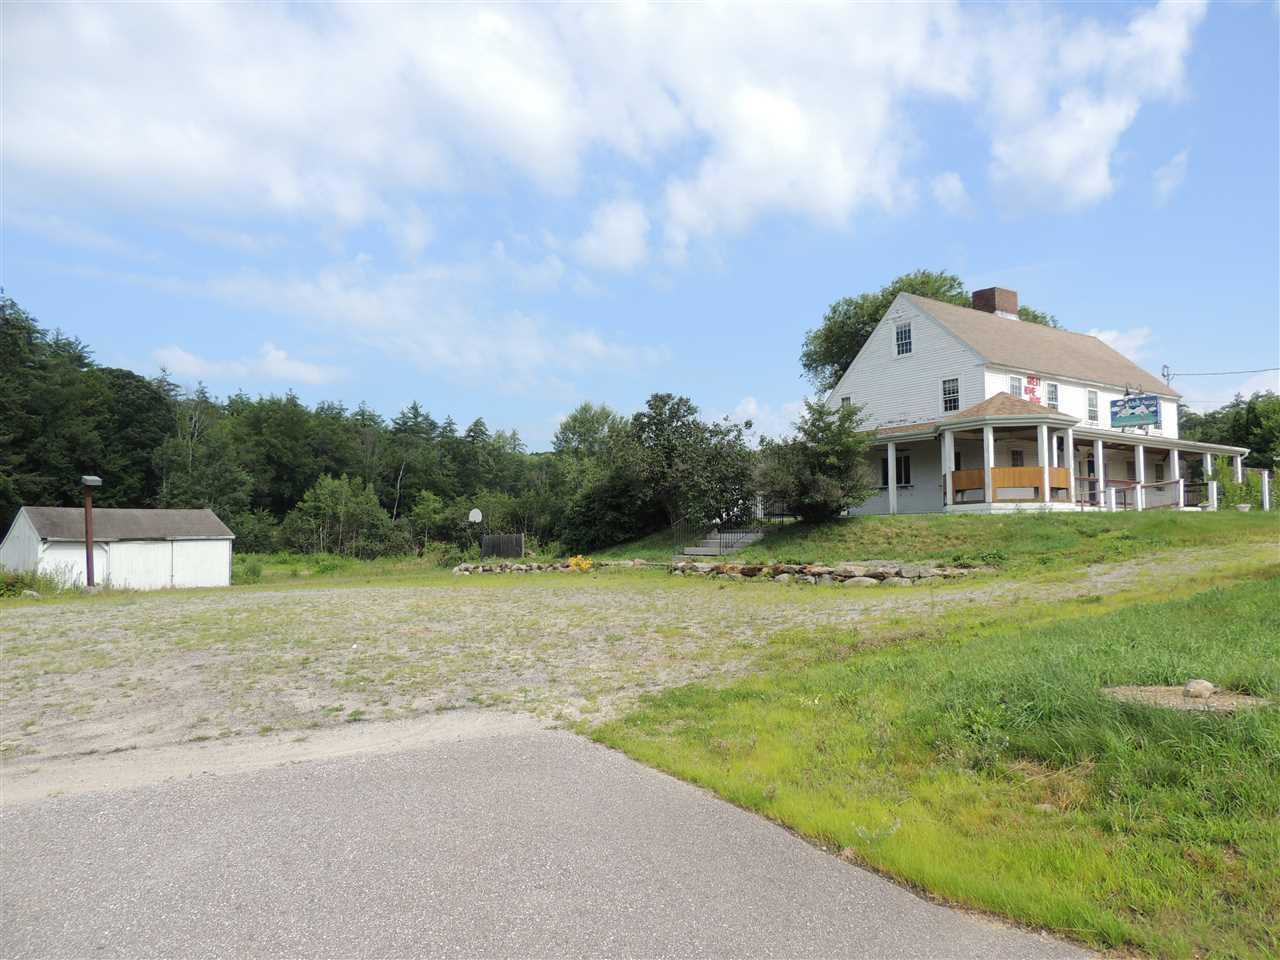 490 LACONIA RD, TILTON, NH — MLS# 4657650 — Better Homes ... Tilton Nh Homes For Sale Photos